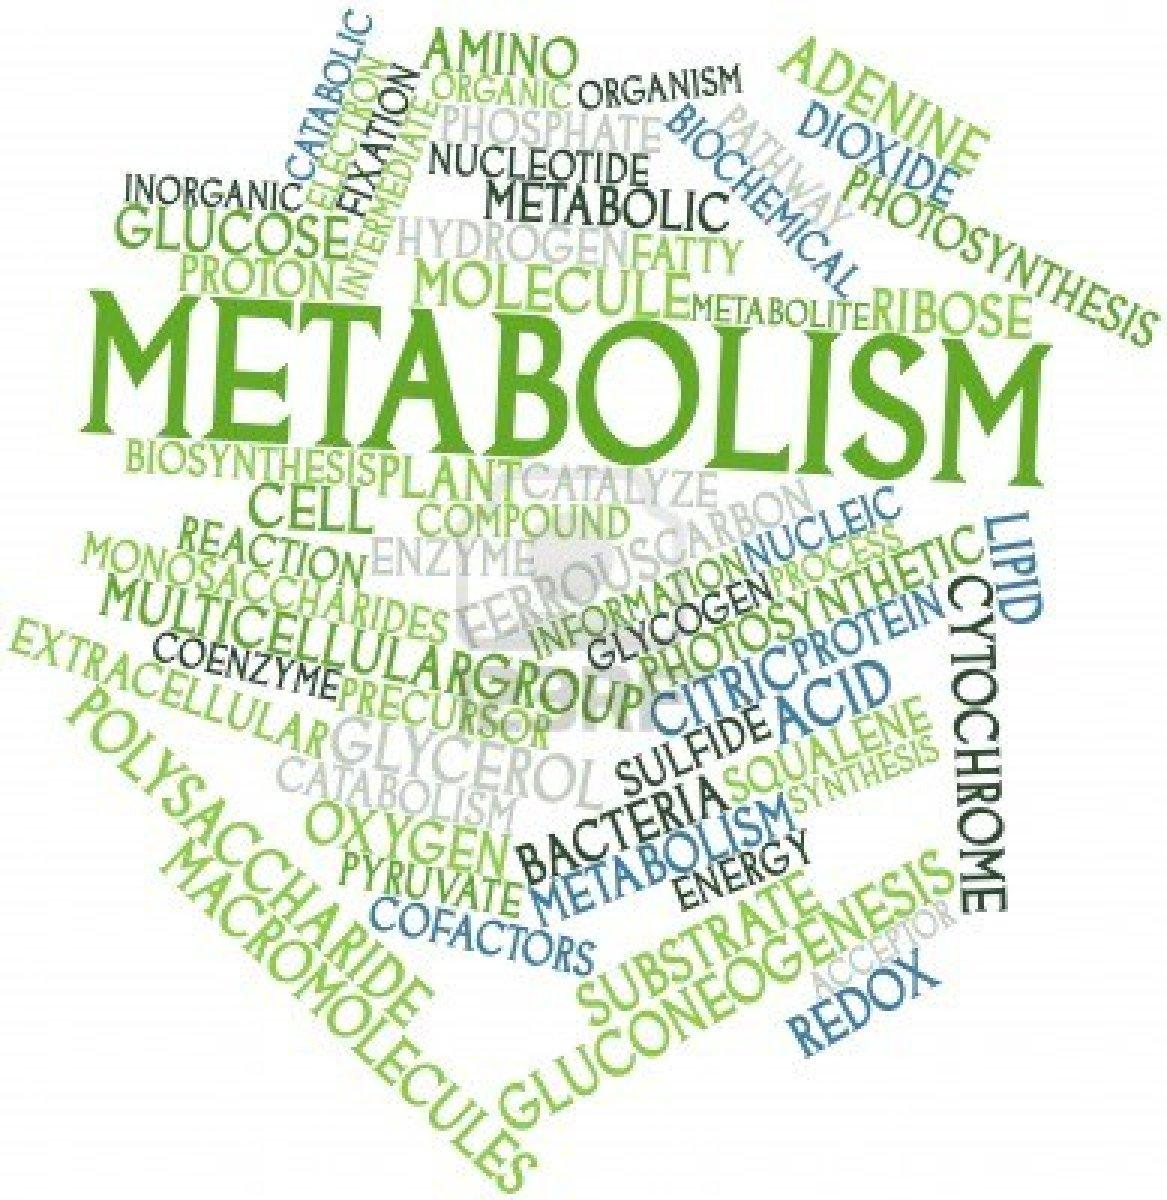 Metabolism  Wikipedia